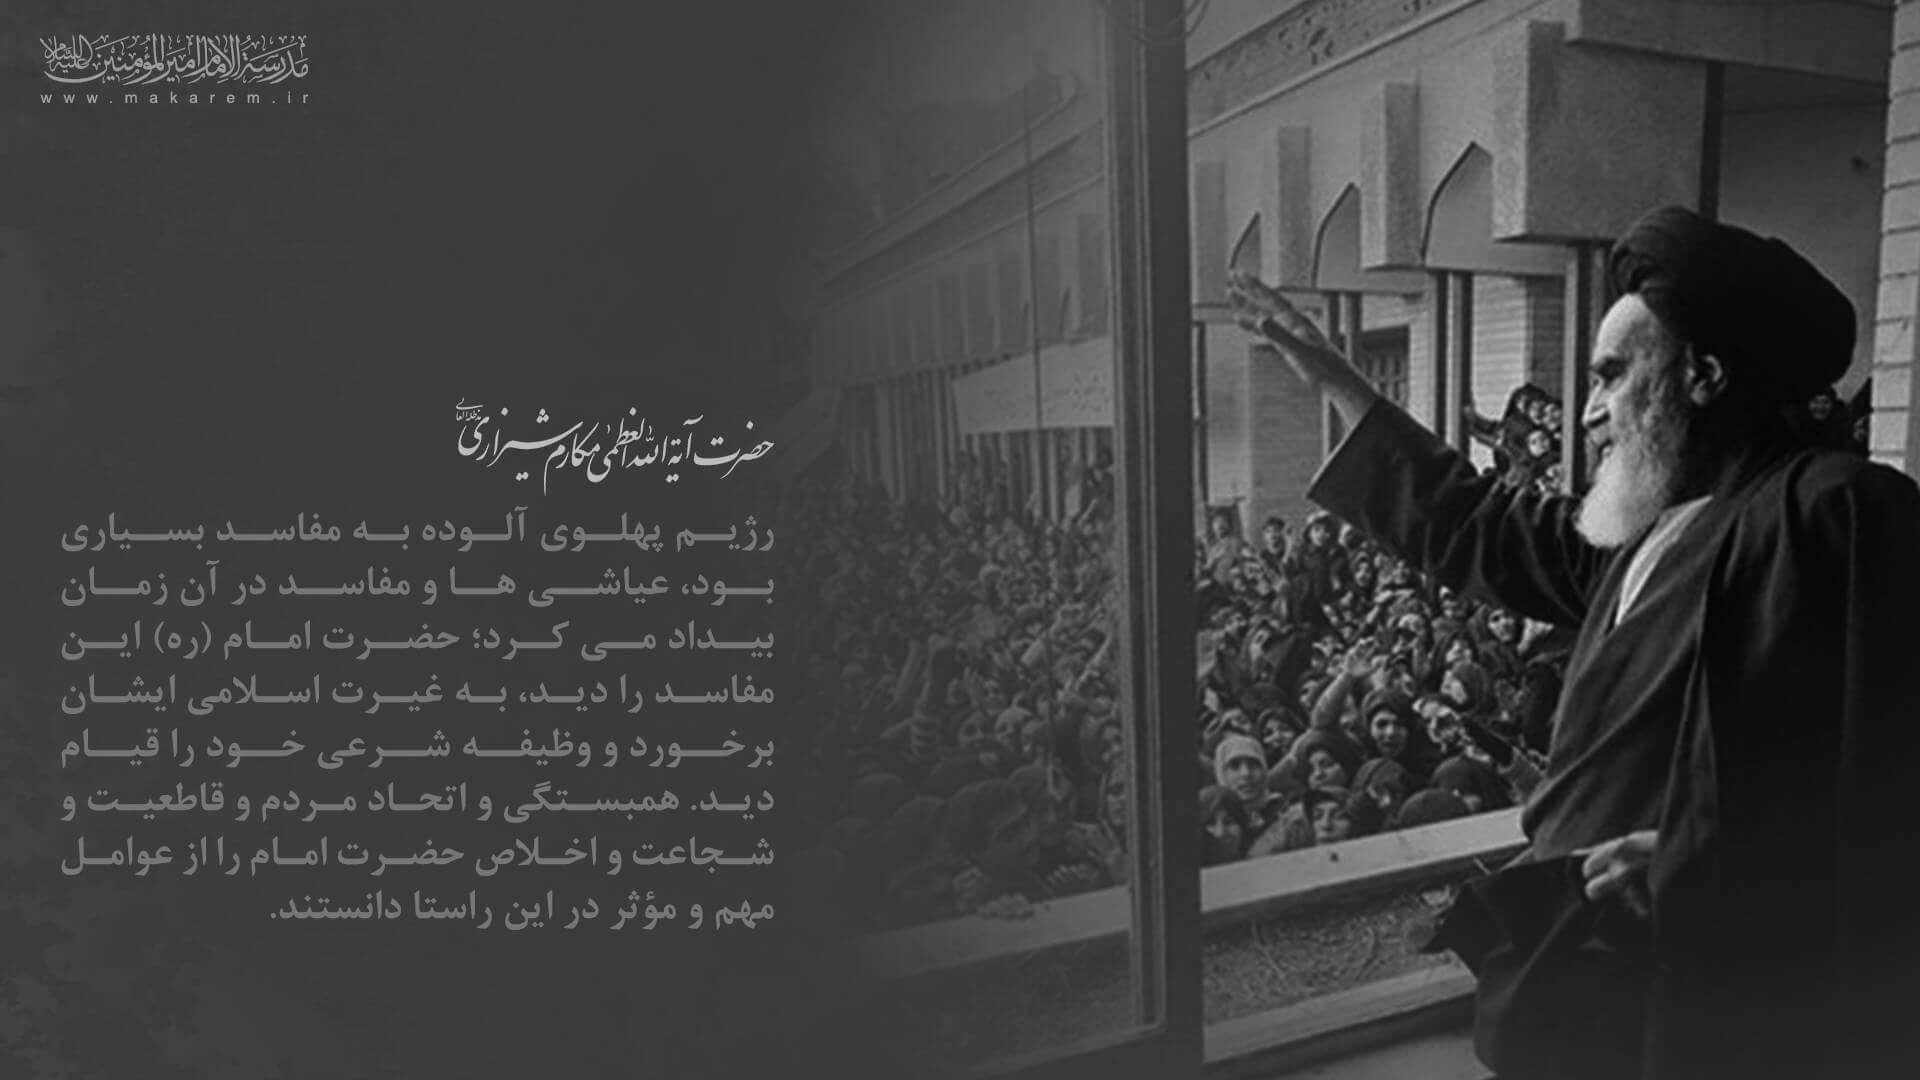 انقلاب 03-مدرسه الامام امیر المومنین (ع)